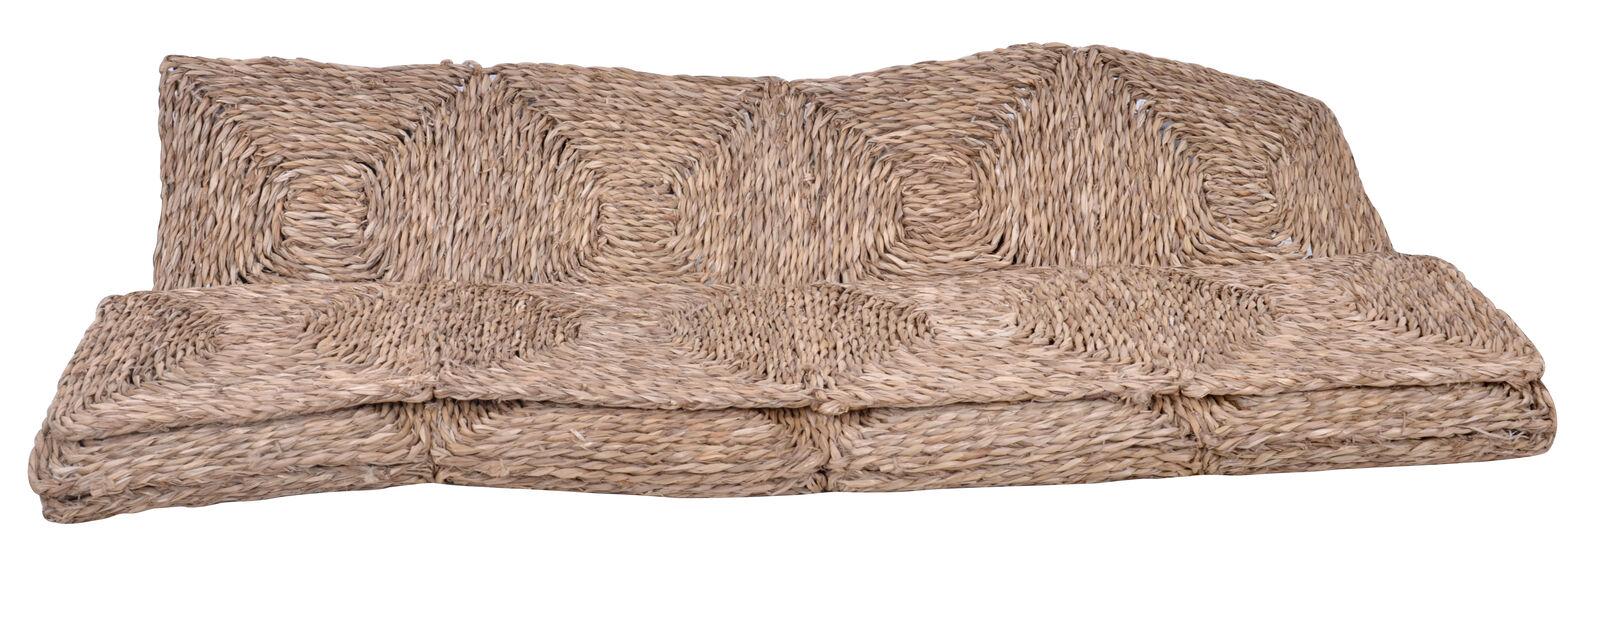 Suorakaiteen muotoinen matto, Pituus 180 cm, Beige